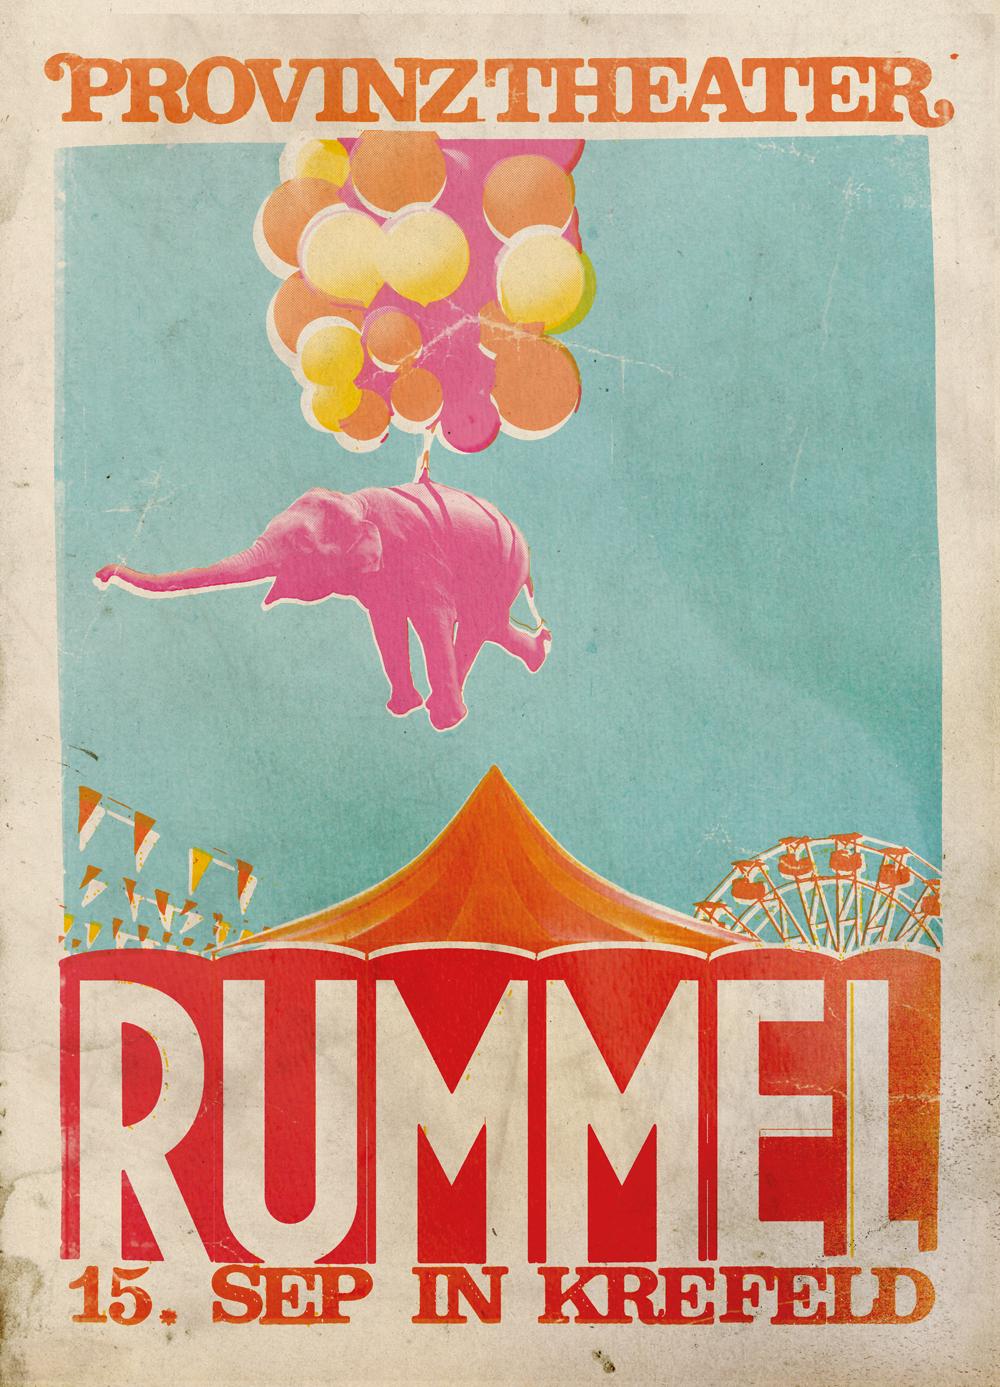 Rummel_postkarte_A6_600dpi_3mm_front_small